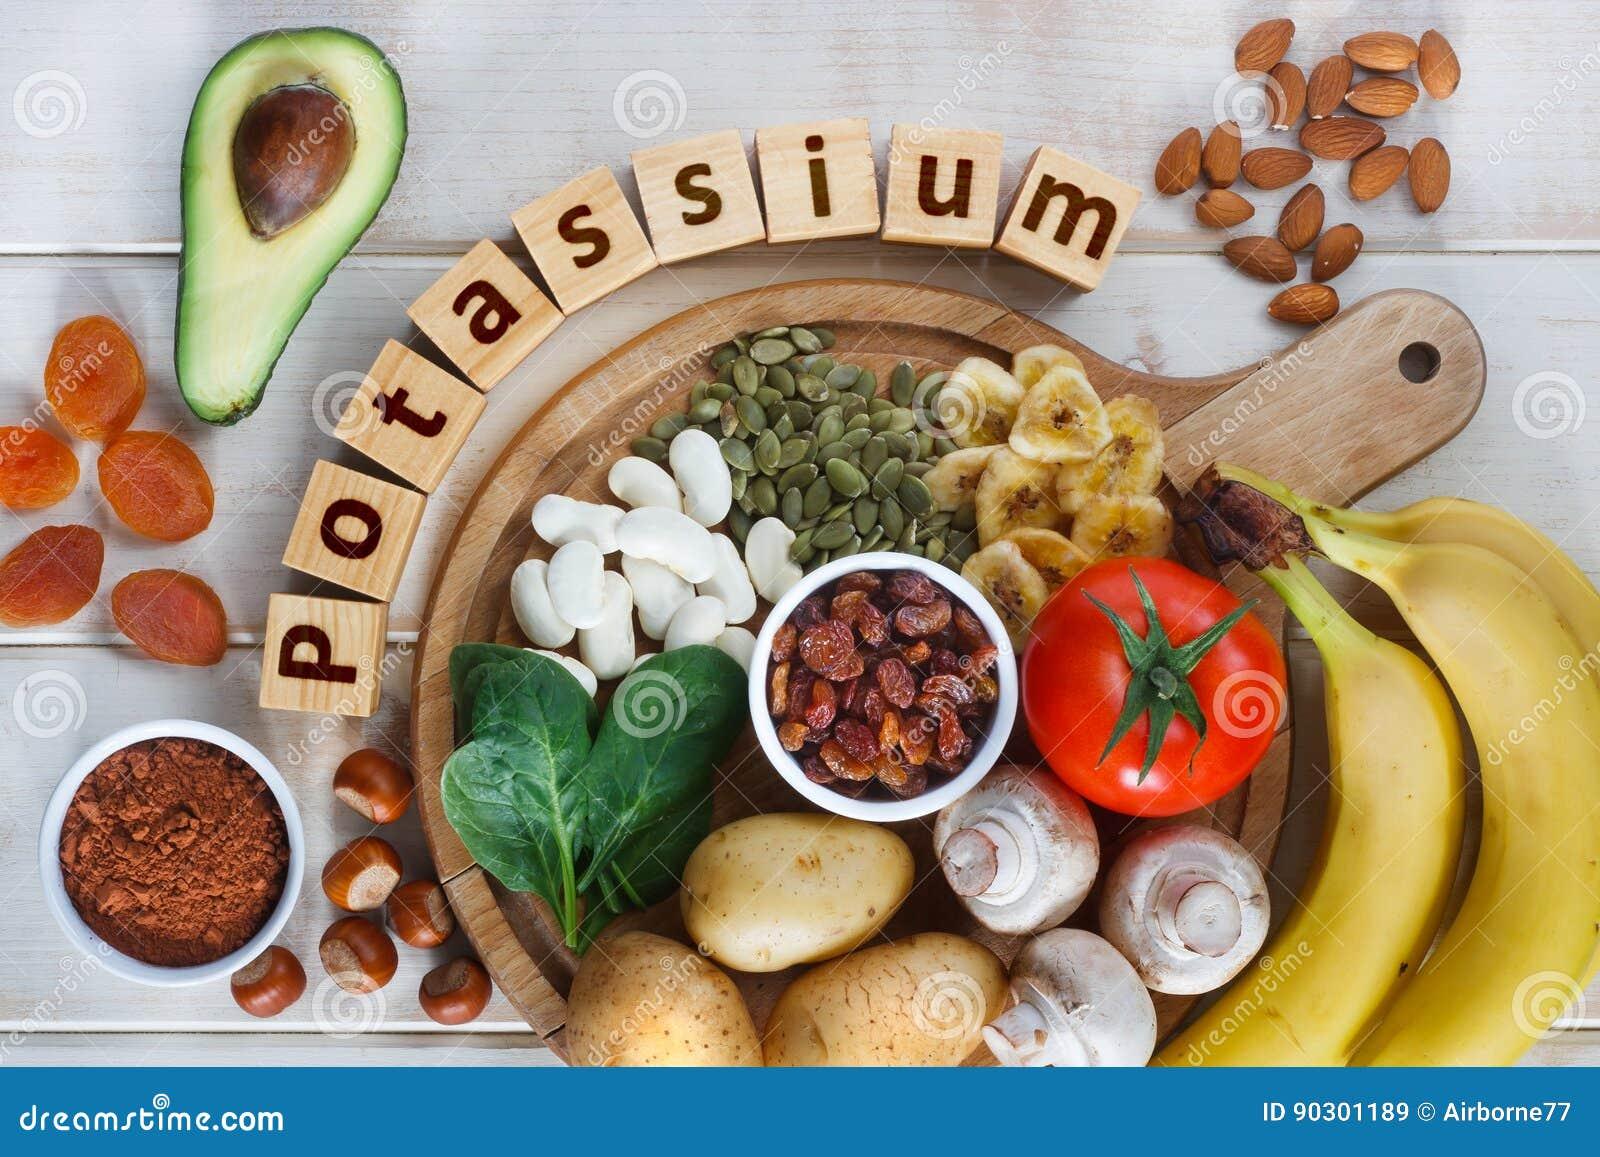 Voedsel Hoogst in Kalium